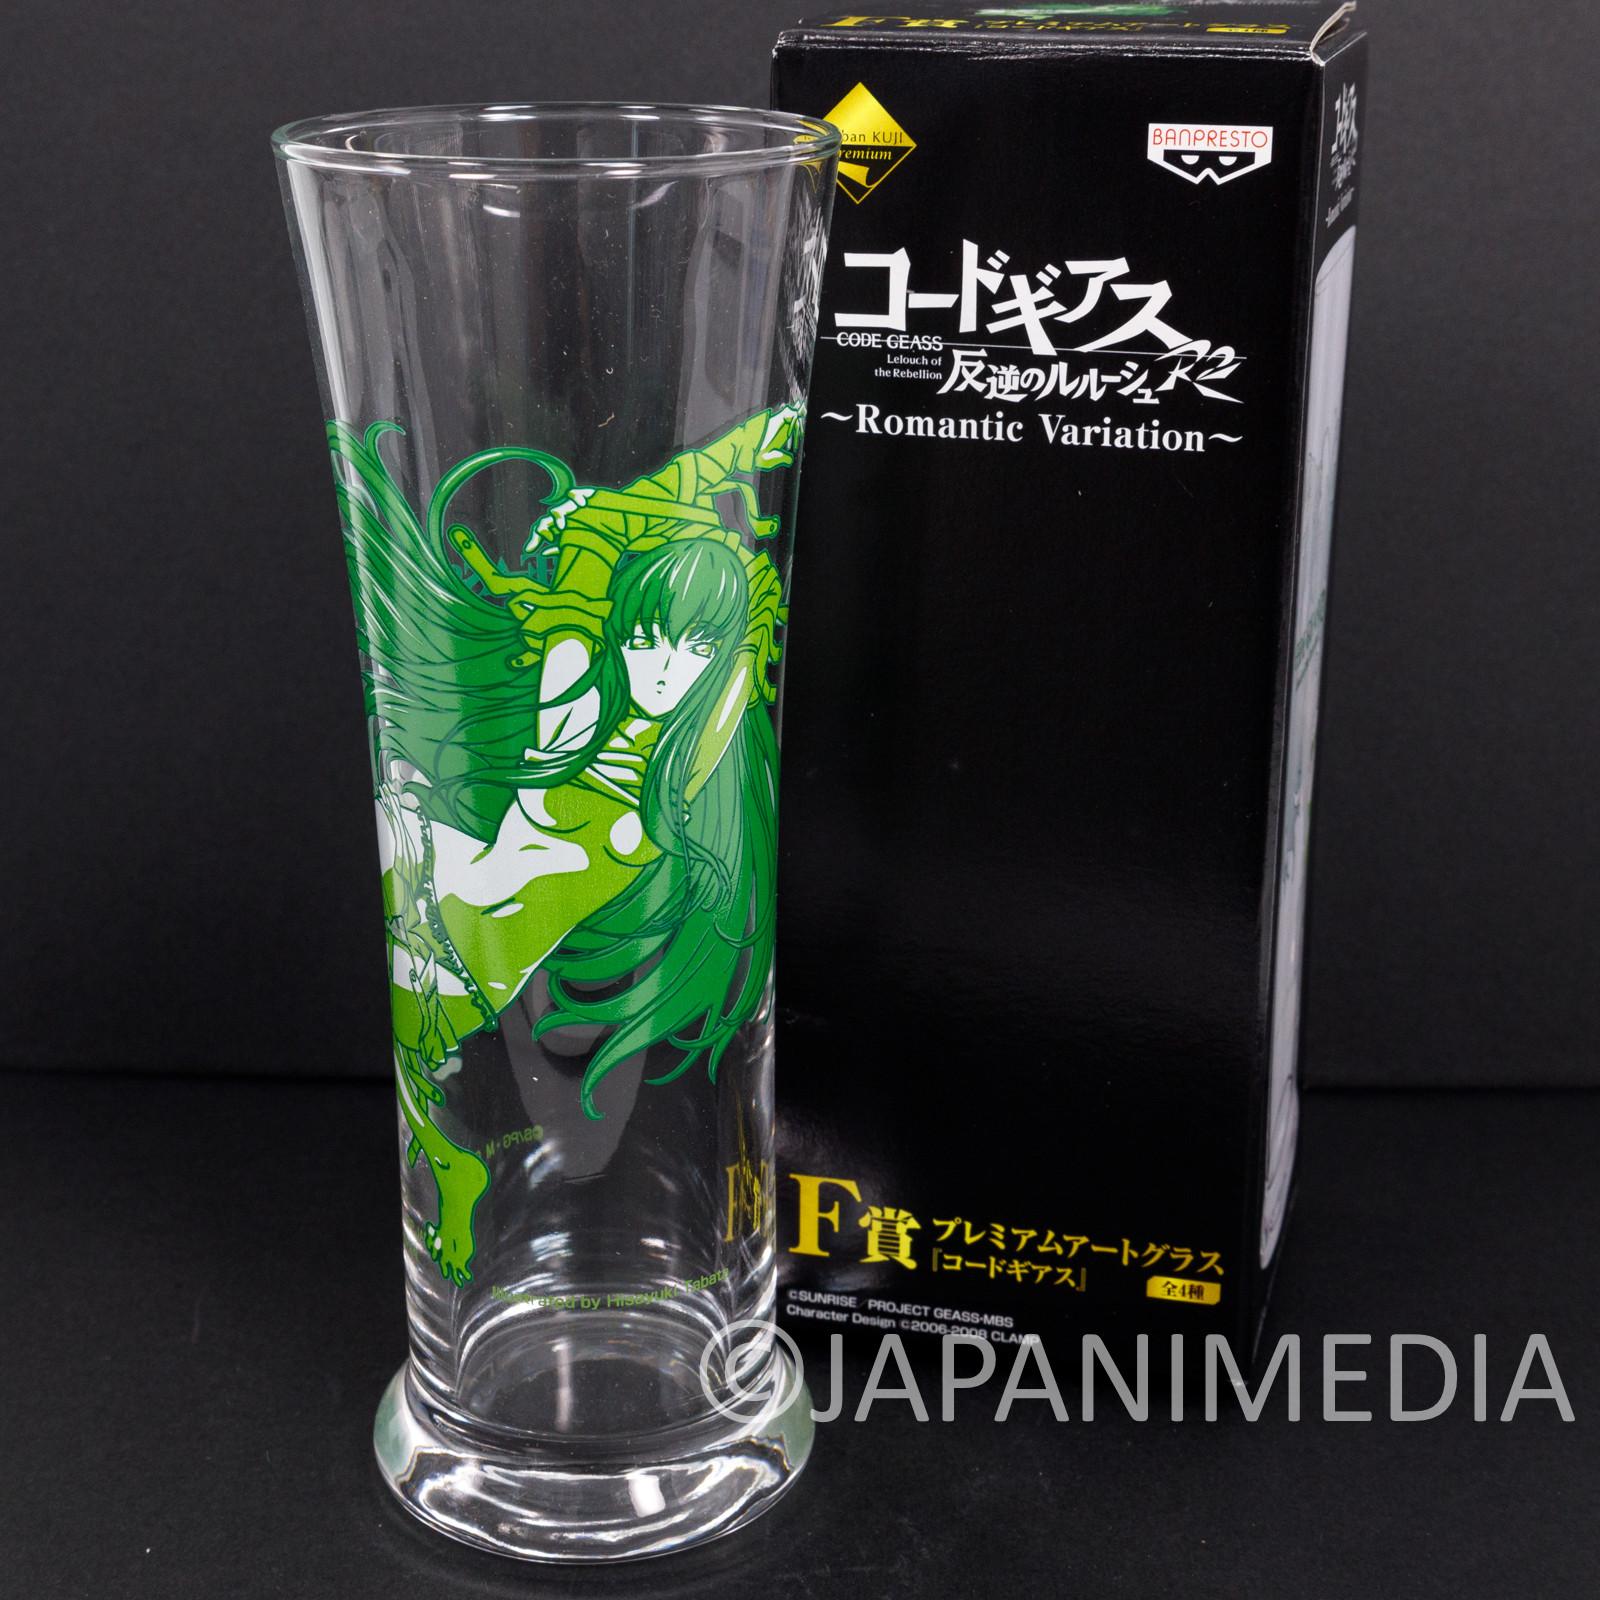 Code Geass R2 C.C. Tall Glass Banpresto JAPAN ANIME MANGA